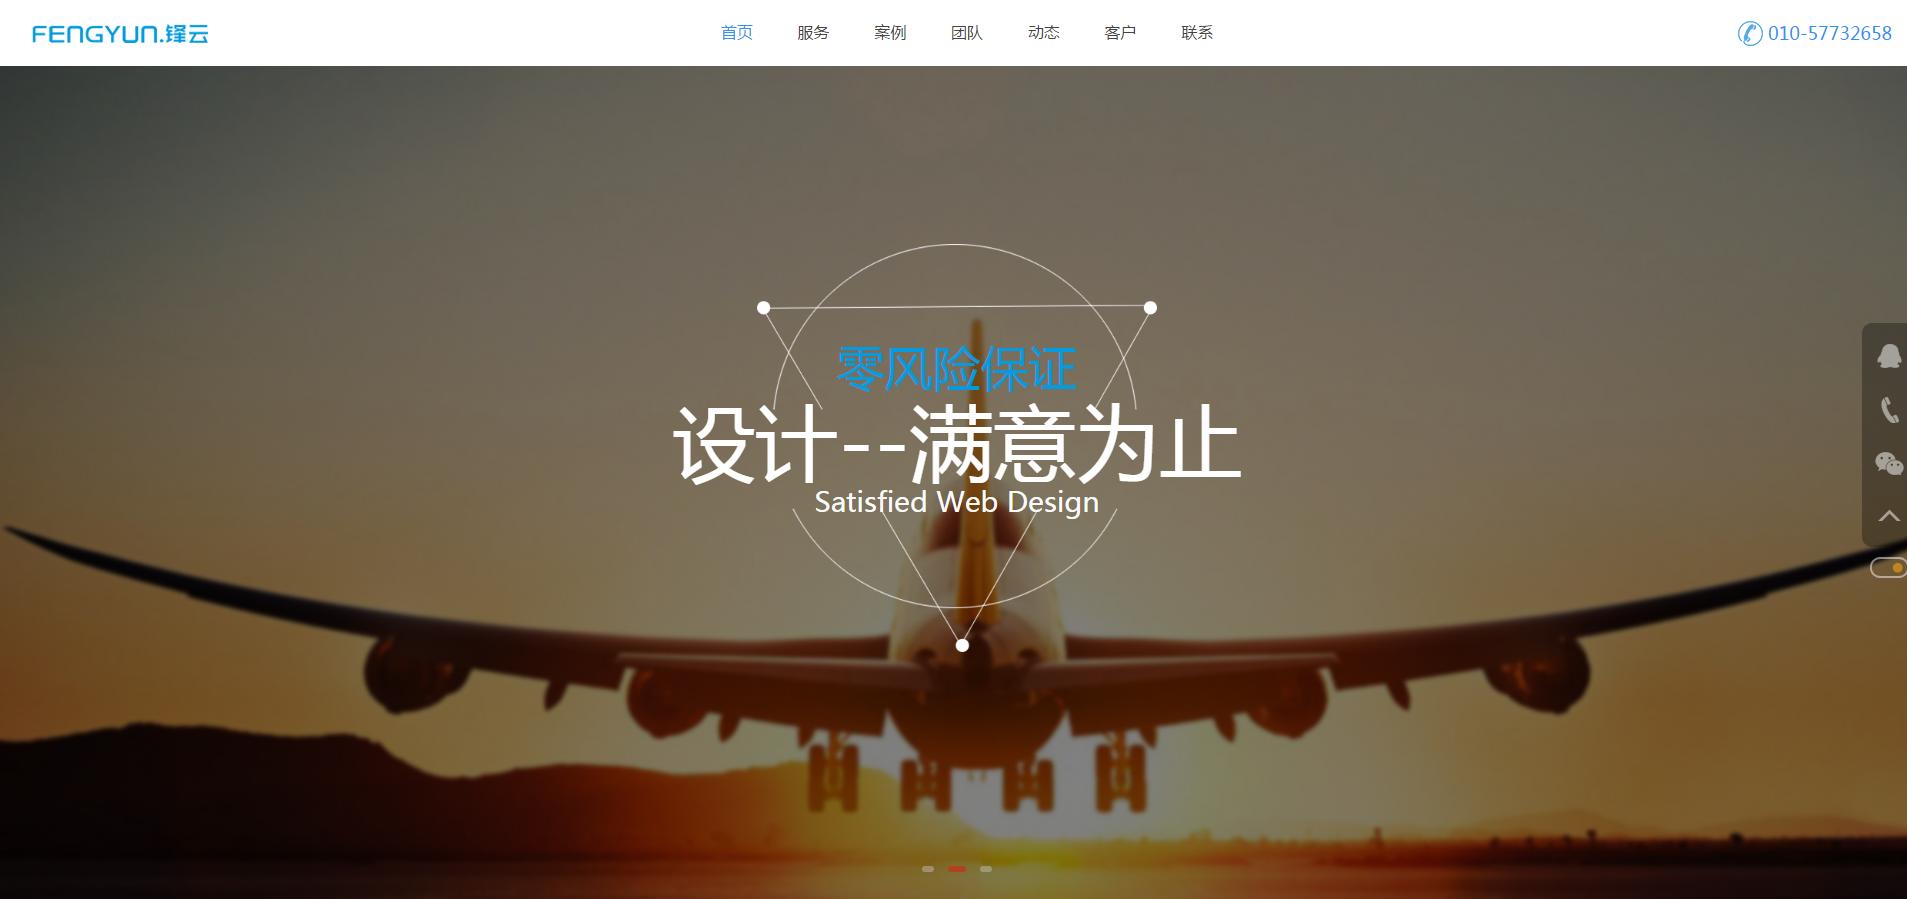 HTML5响应式网络科技公司网站模板下载